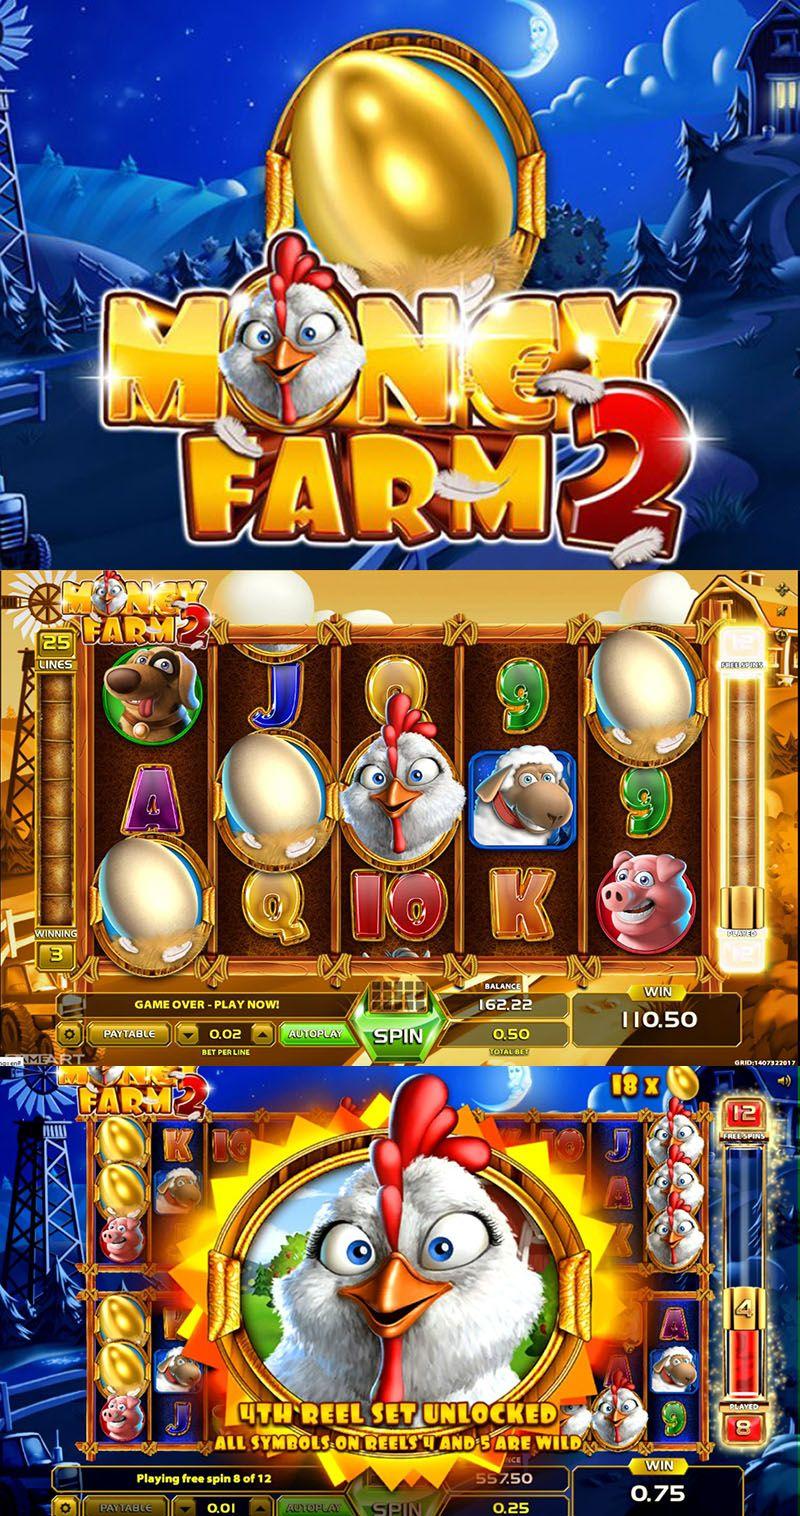 Online casino legal schweiz